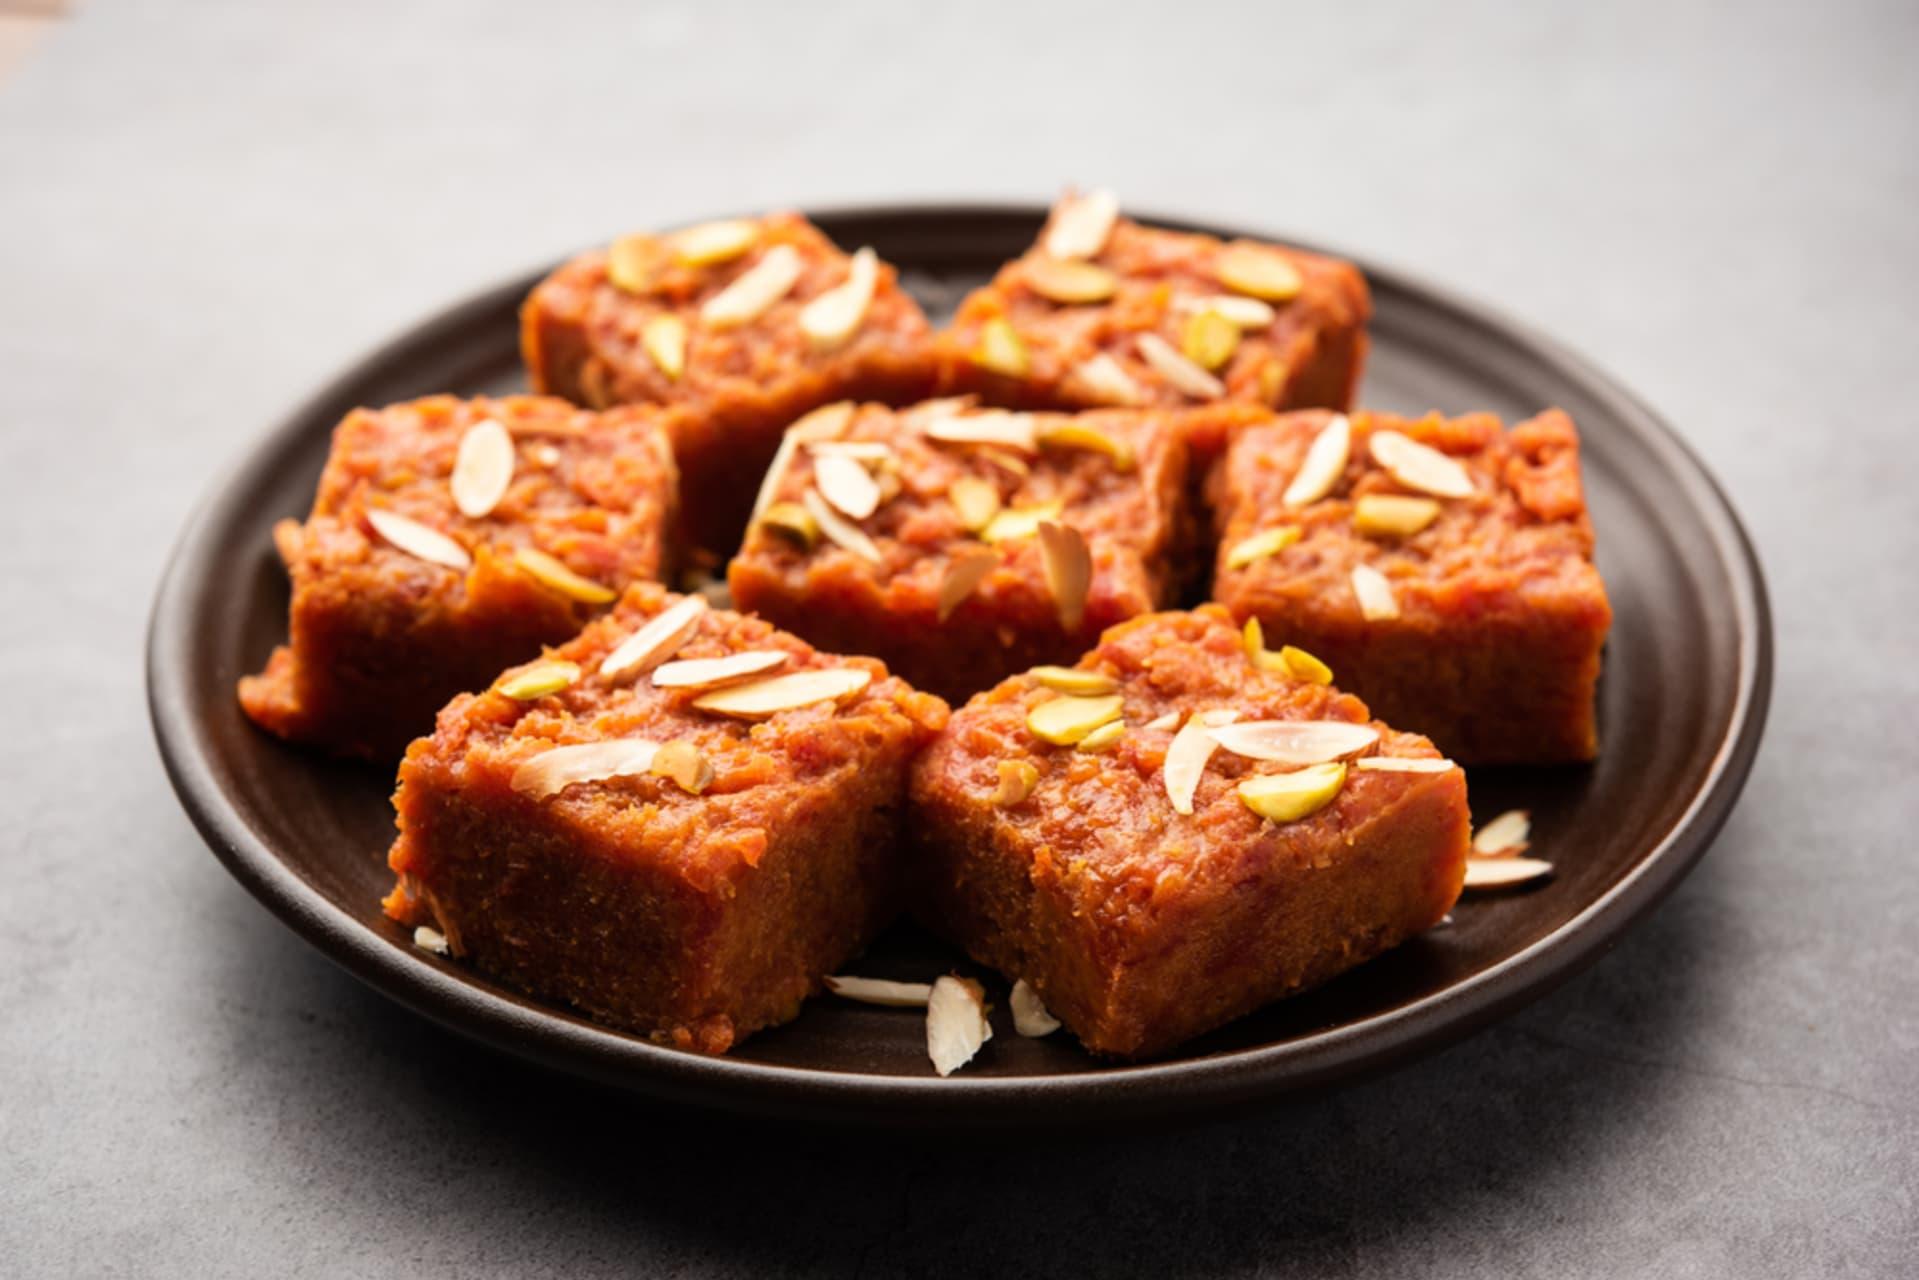 Kerala - Carrot Pudding (Cooking)